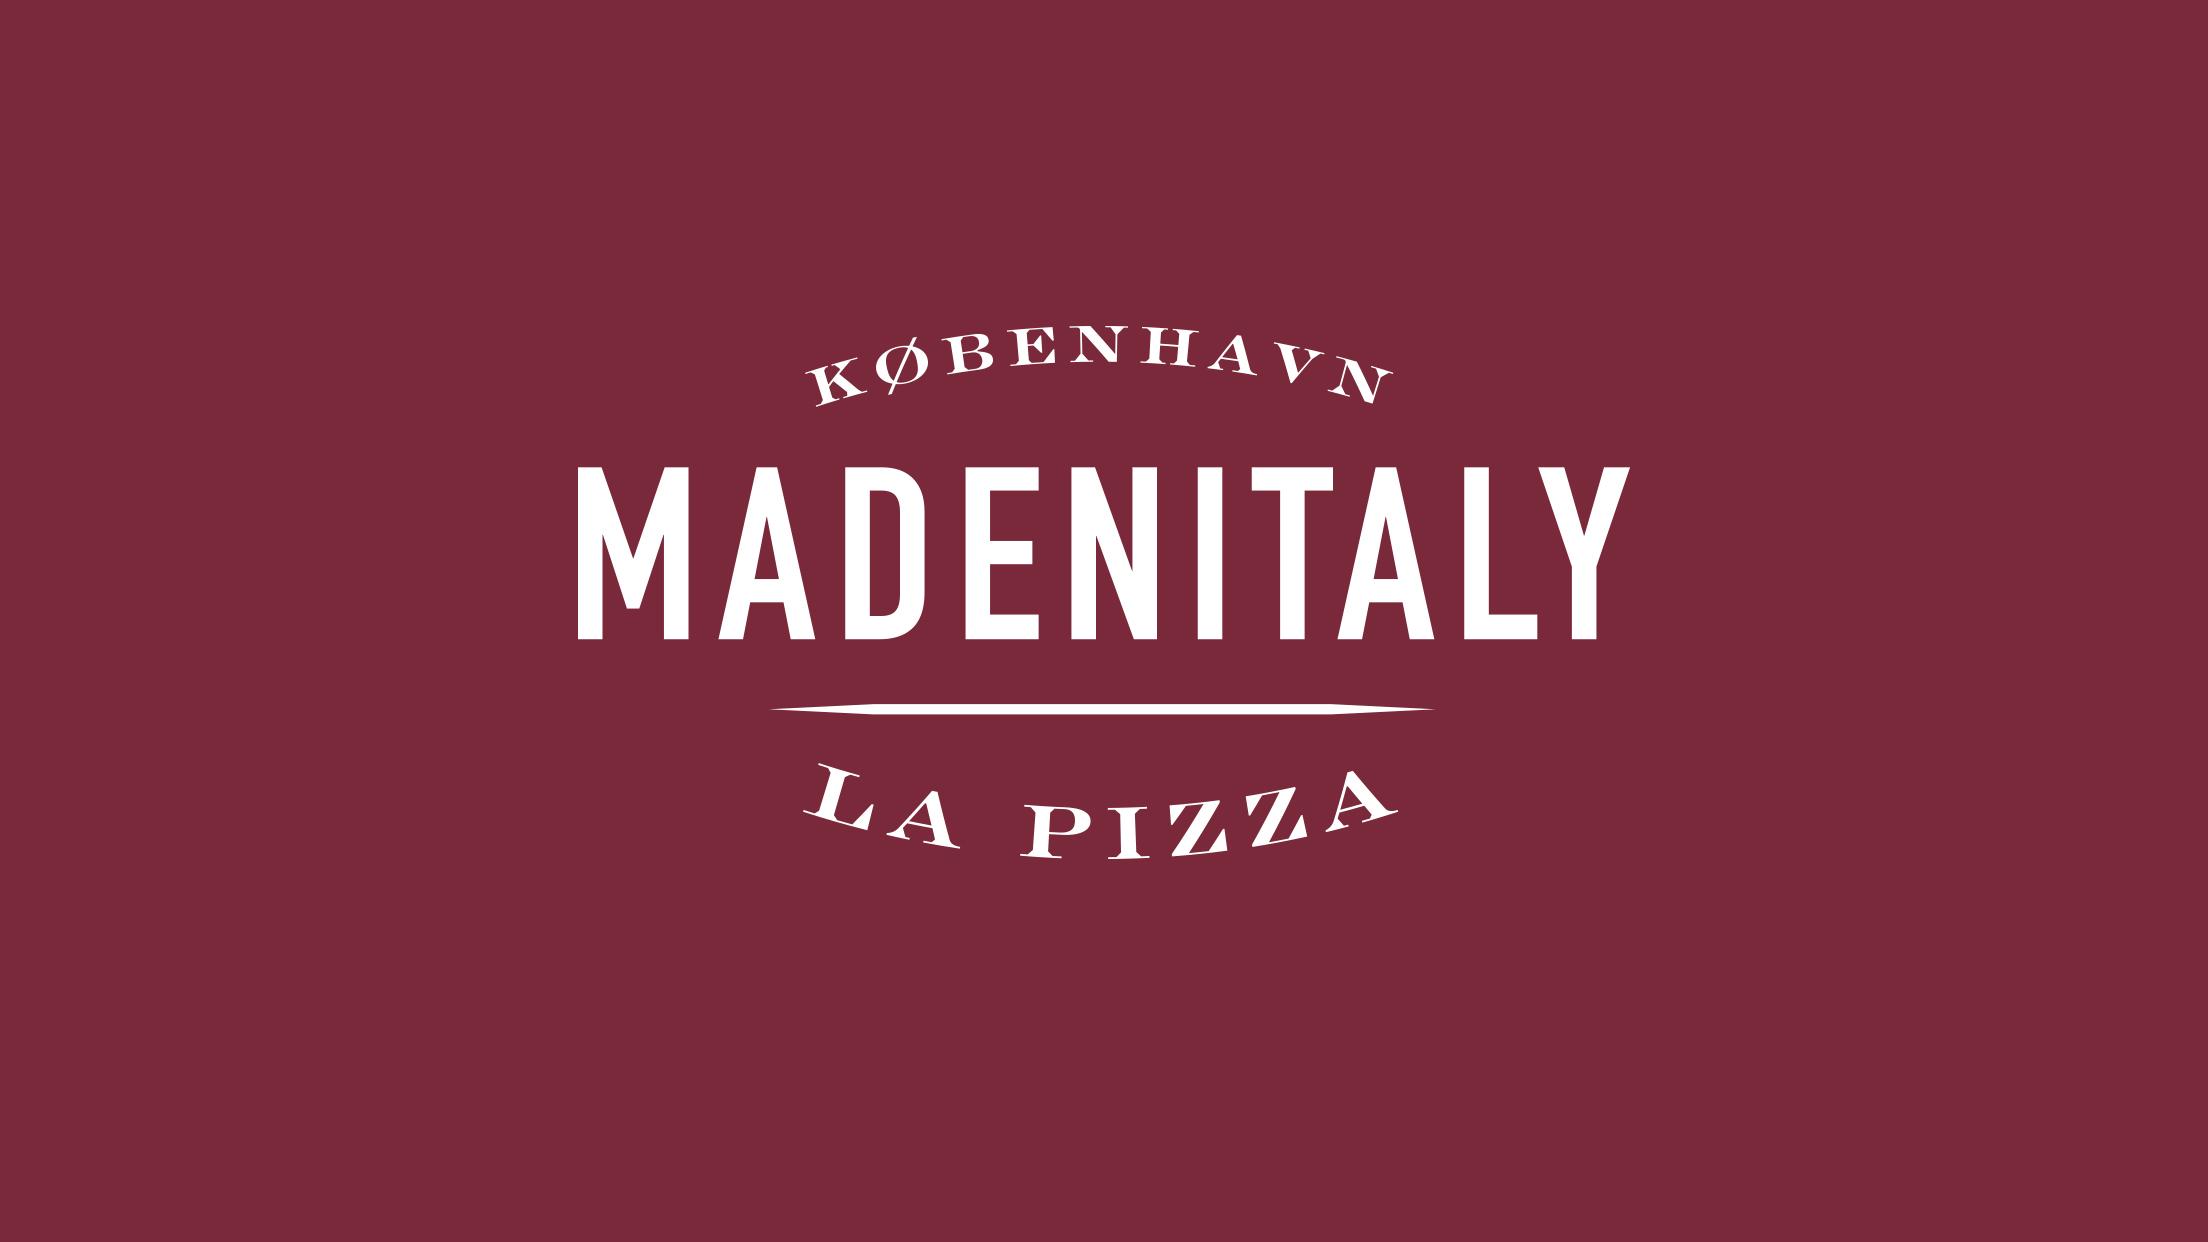 MADENITALY - marchio